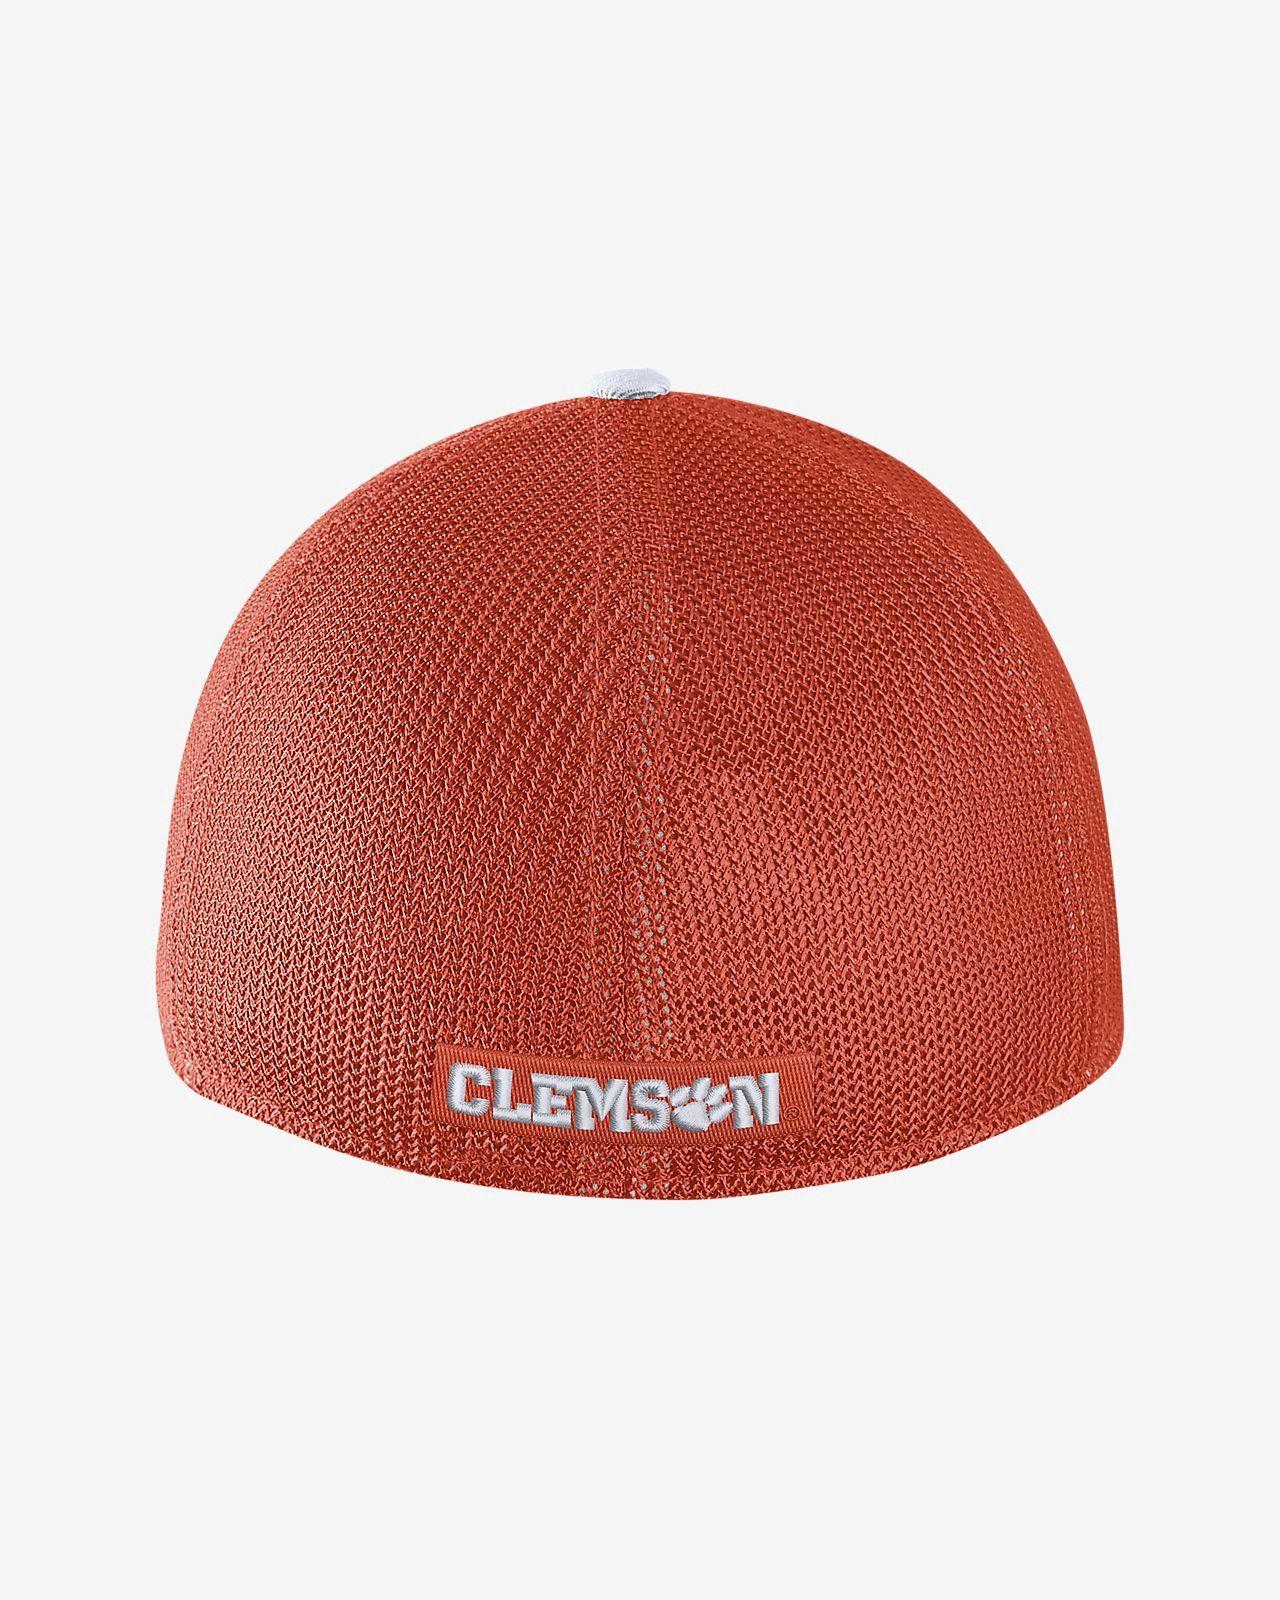 c5833d24224 Nike College Classic 99 Swoosh Flex (Clemson) Fitted Hat - FLX Orange